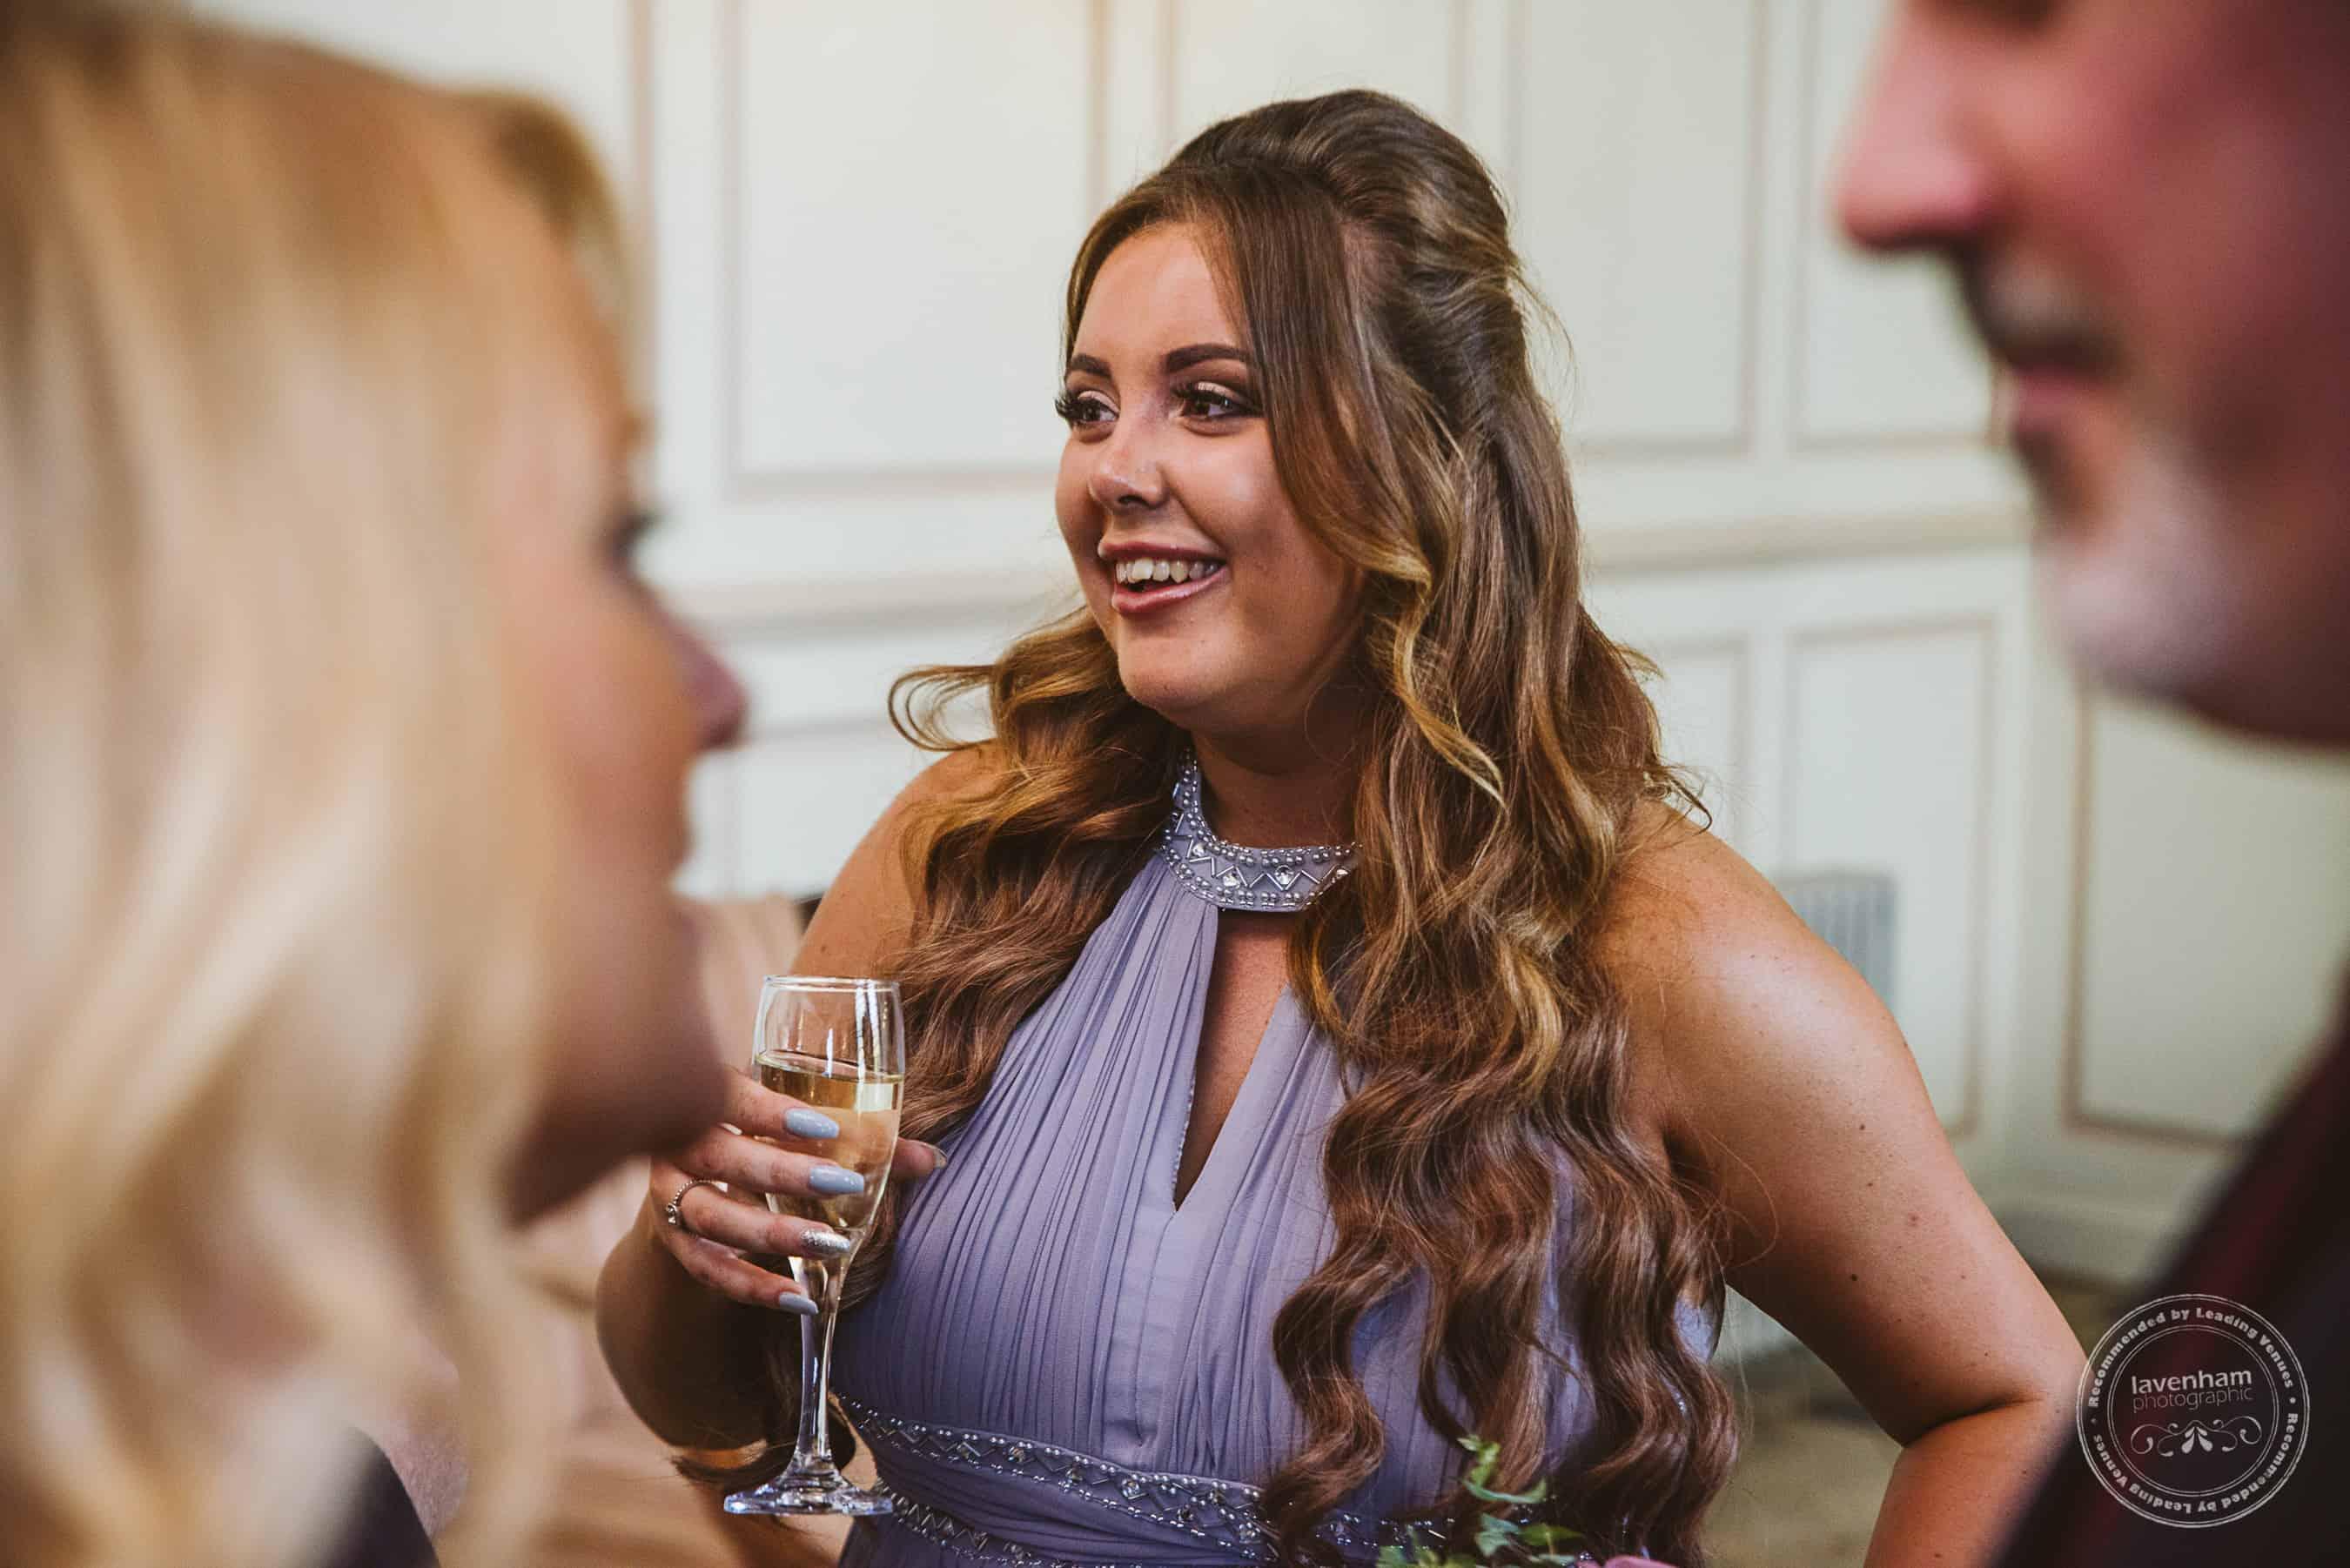 281018 Gosfield Hall Wedding Photography Lavenham Photographic 065